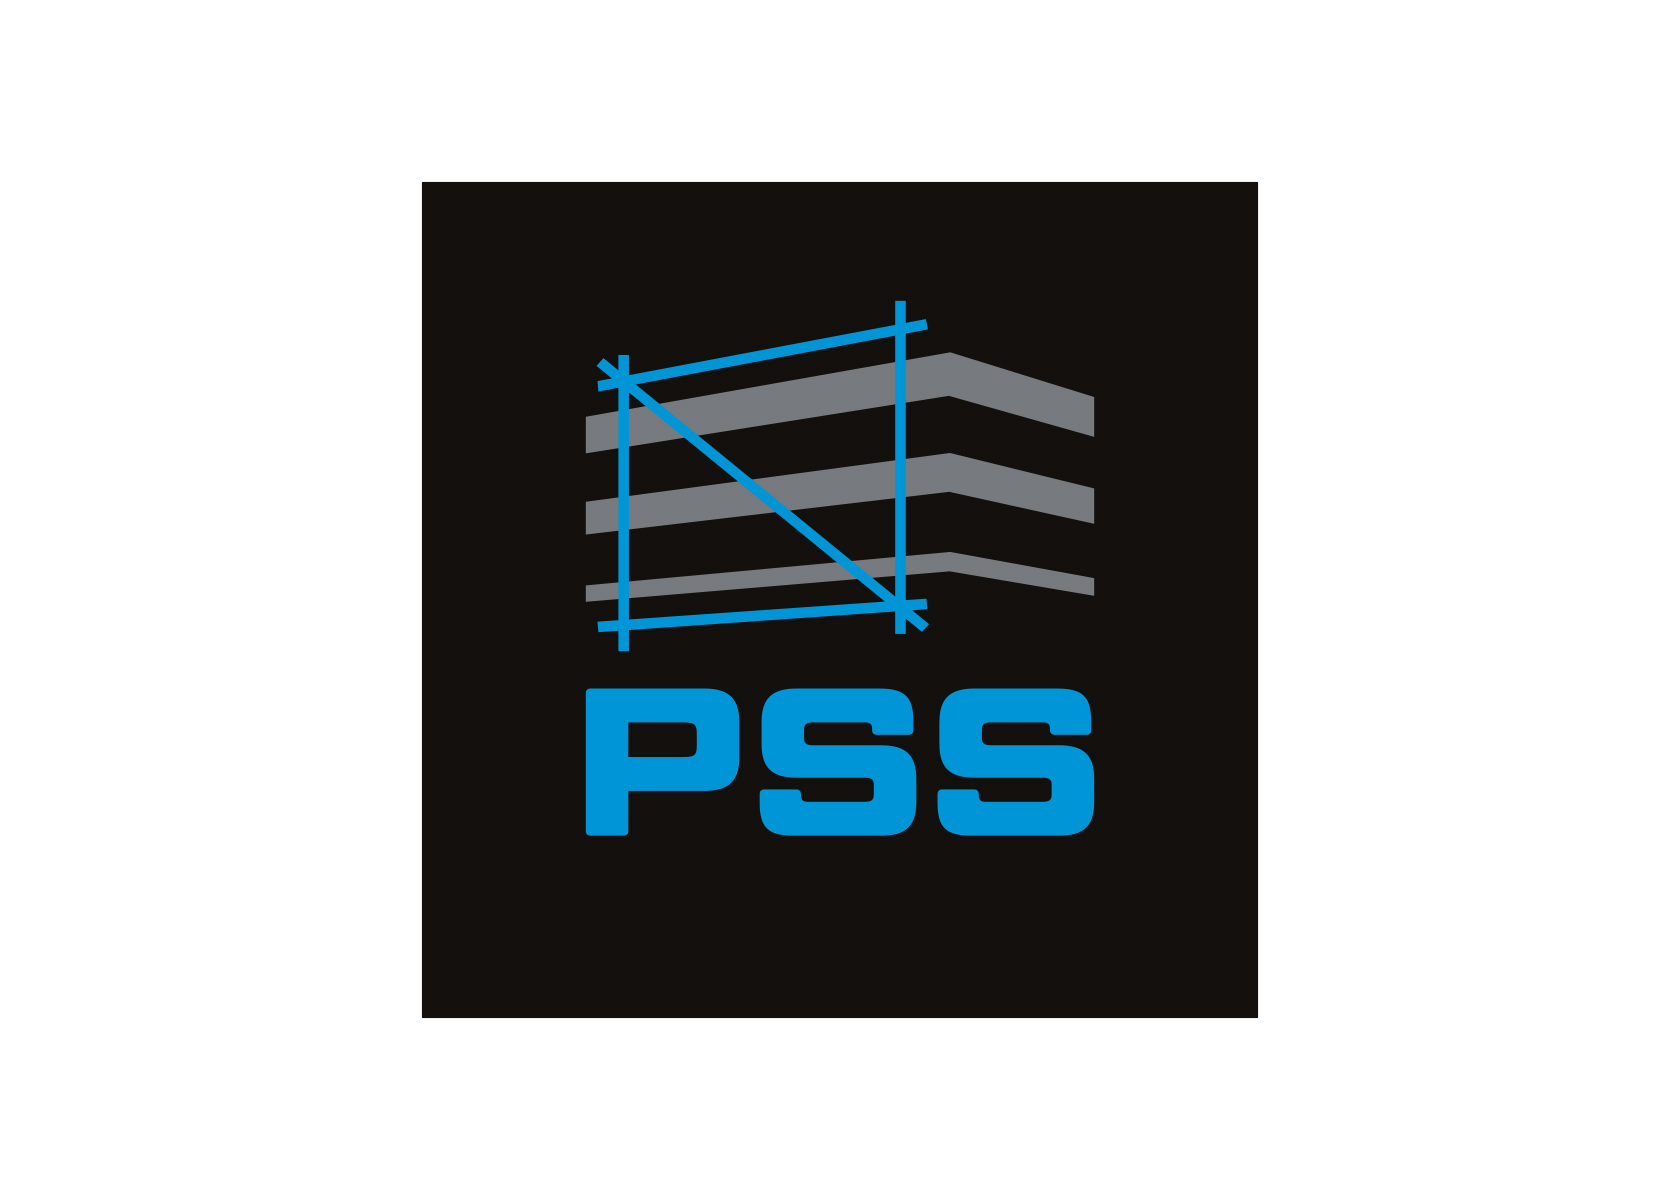 Trade logo design - designs like these